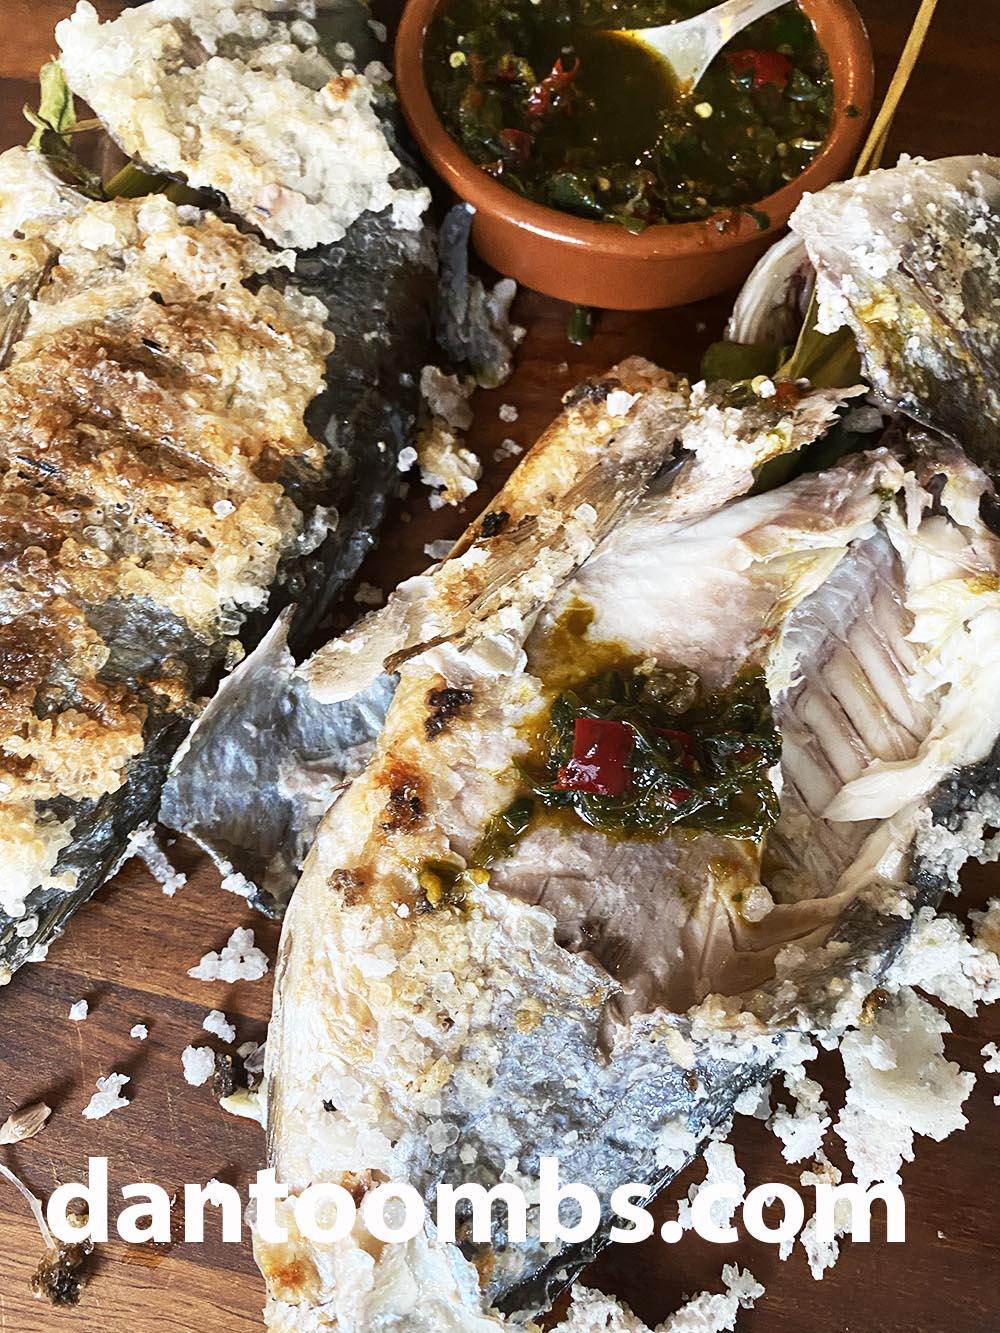 Thai salt crusted fish